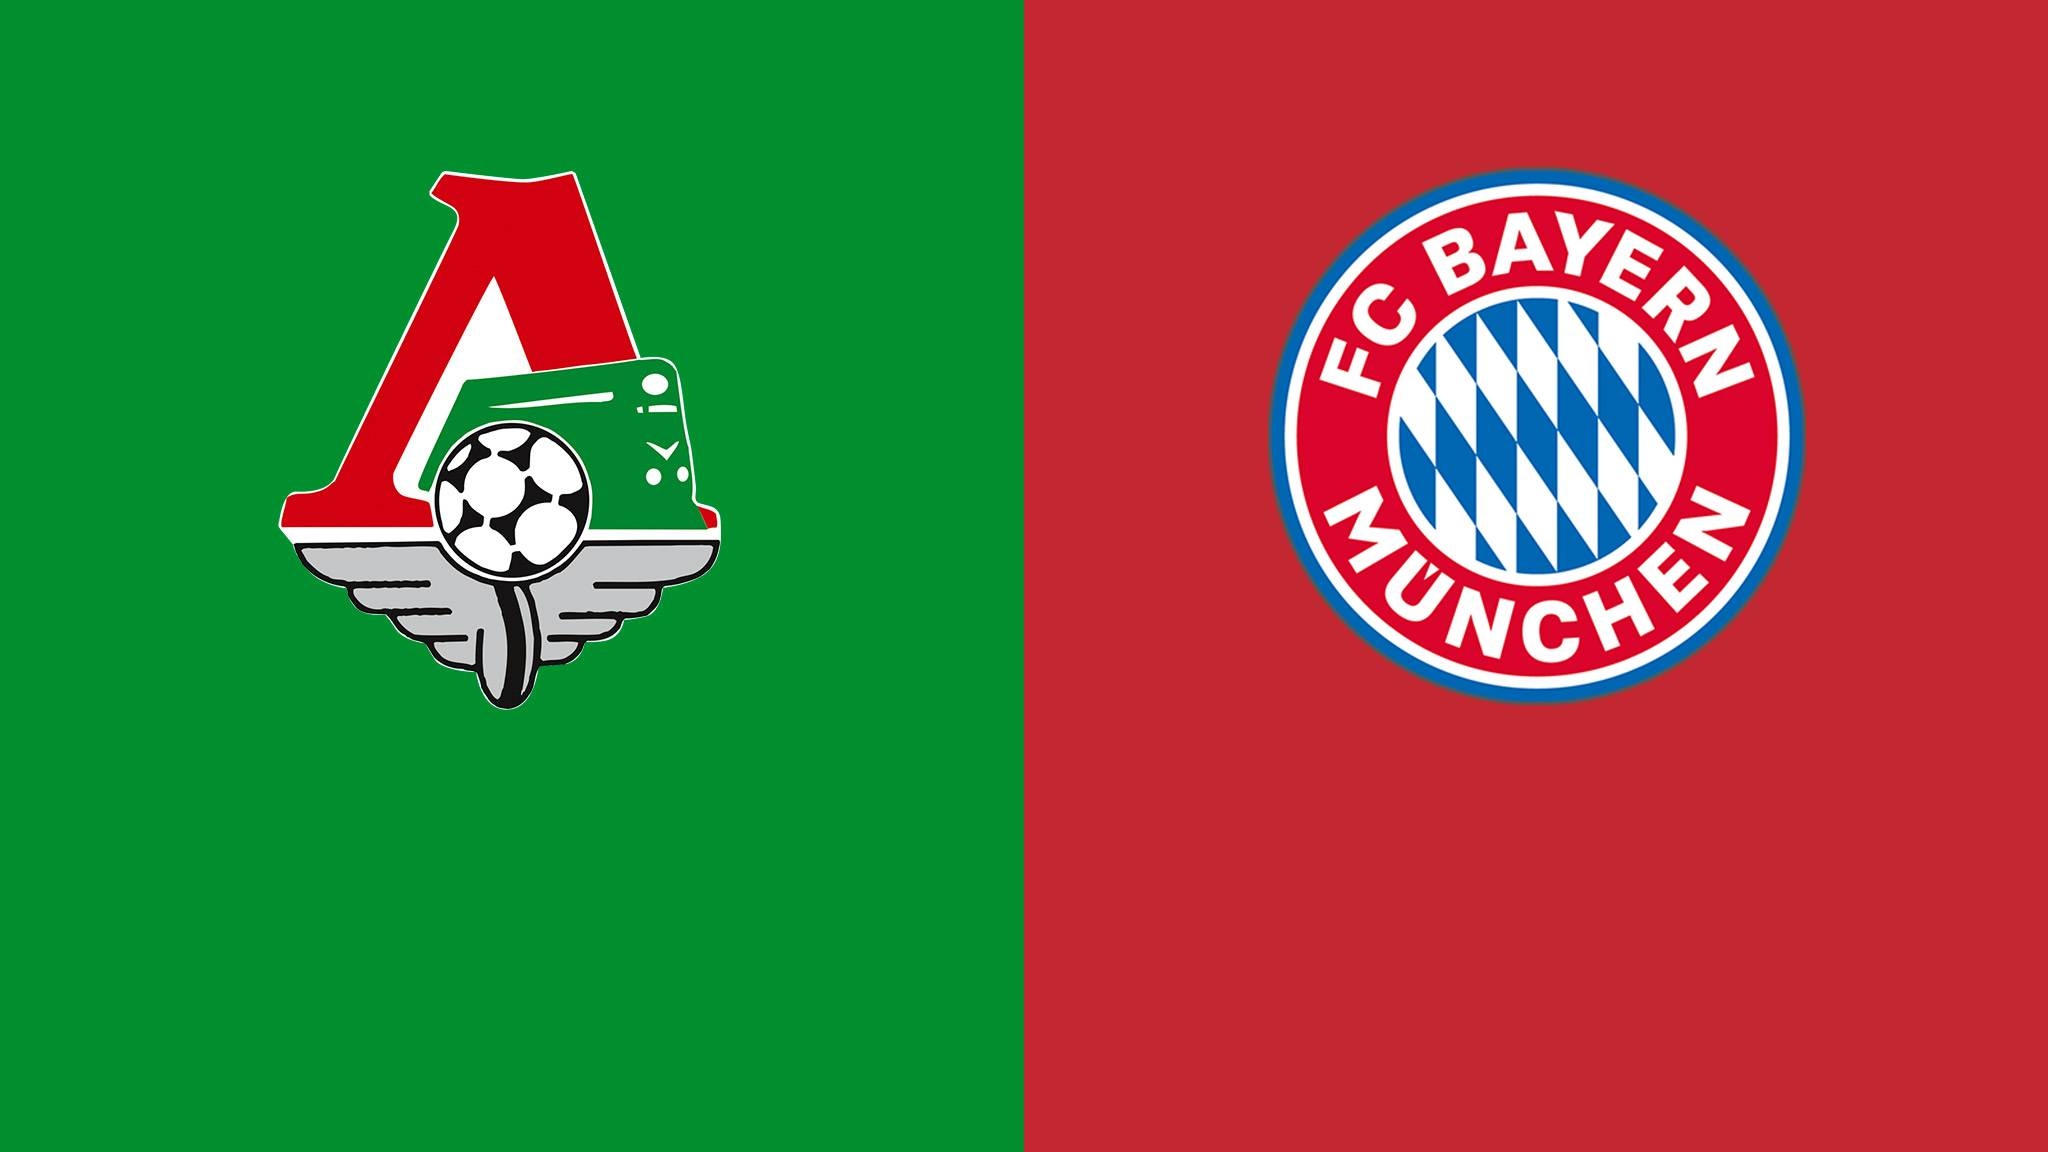 بث مباشر مباراة بايرن ميونخ ولوكوموتيف موسكو